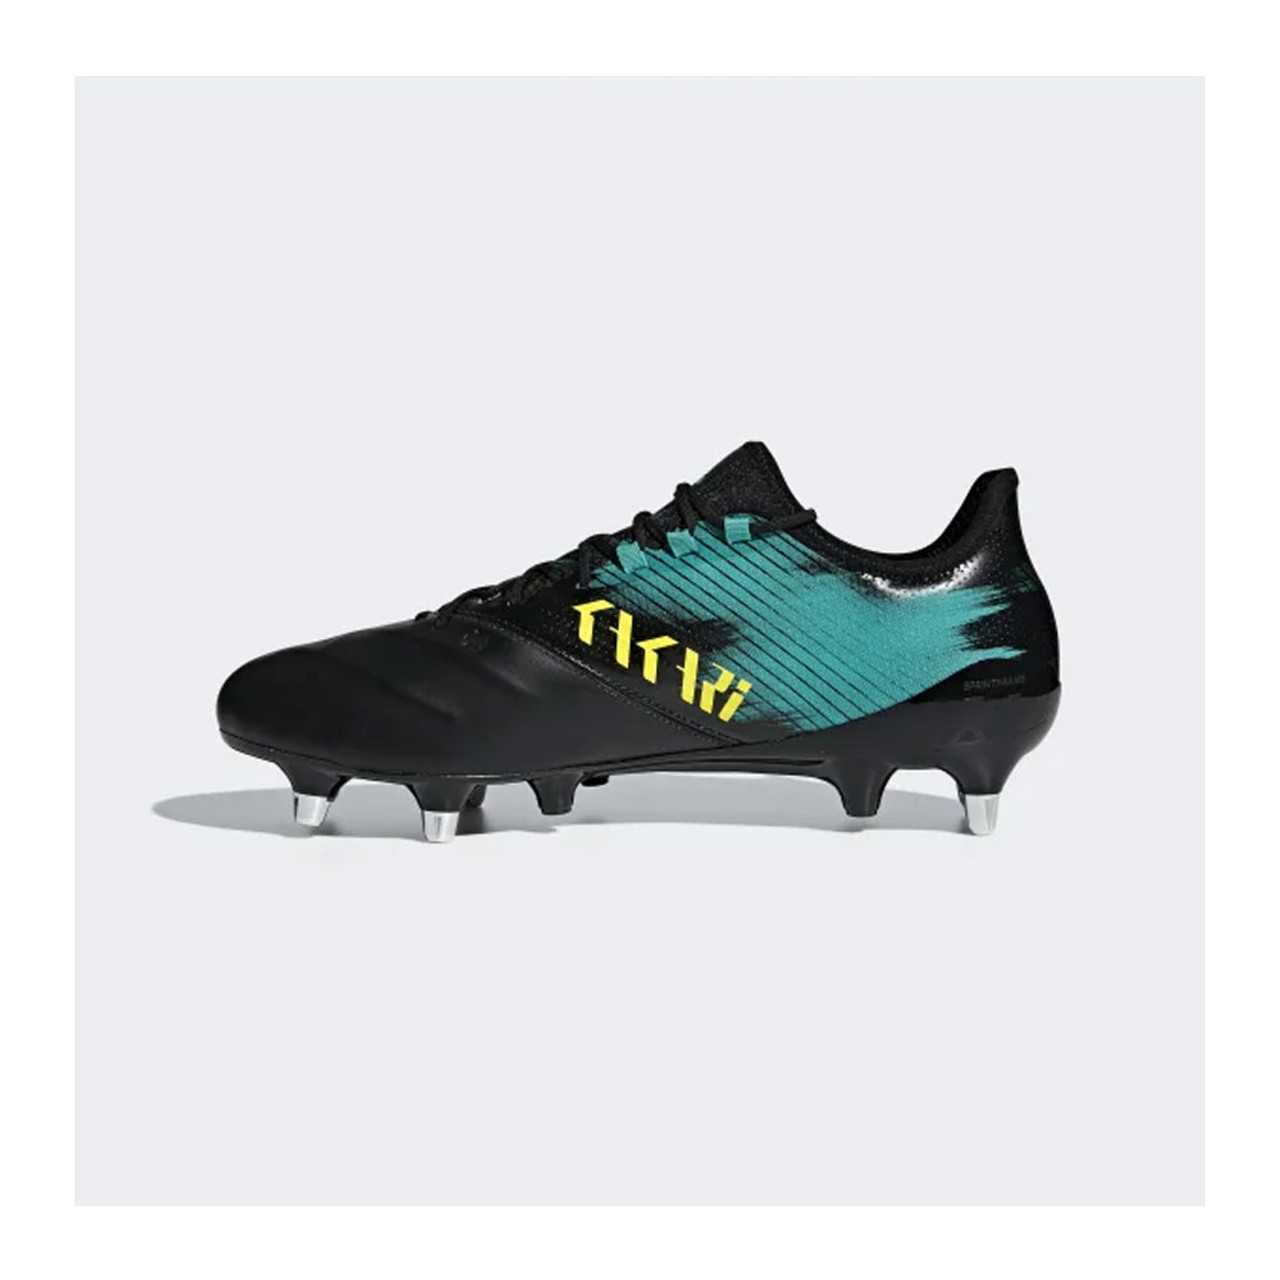 huge discount 23e59 08bdc ADIDAS Kakari Light Soft Ground rugby boots  core black shock yellow hi res  aqua